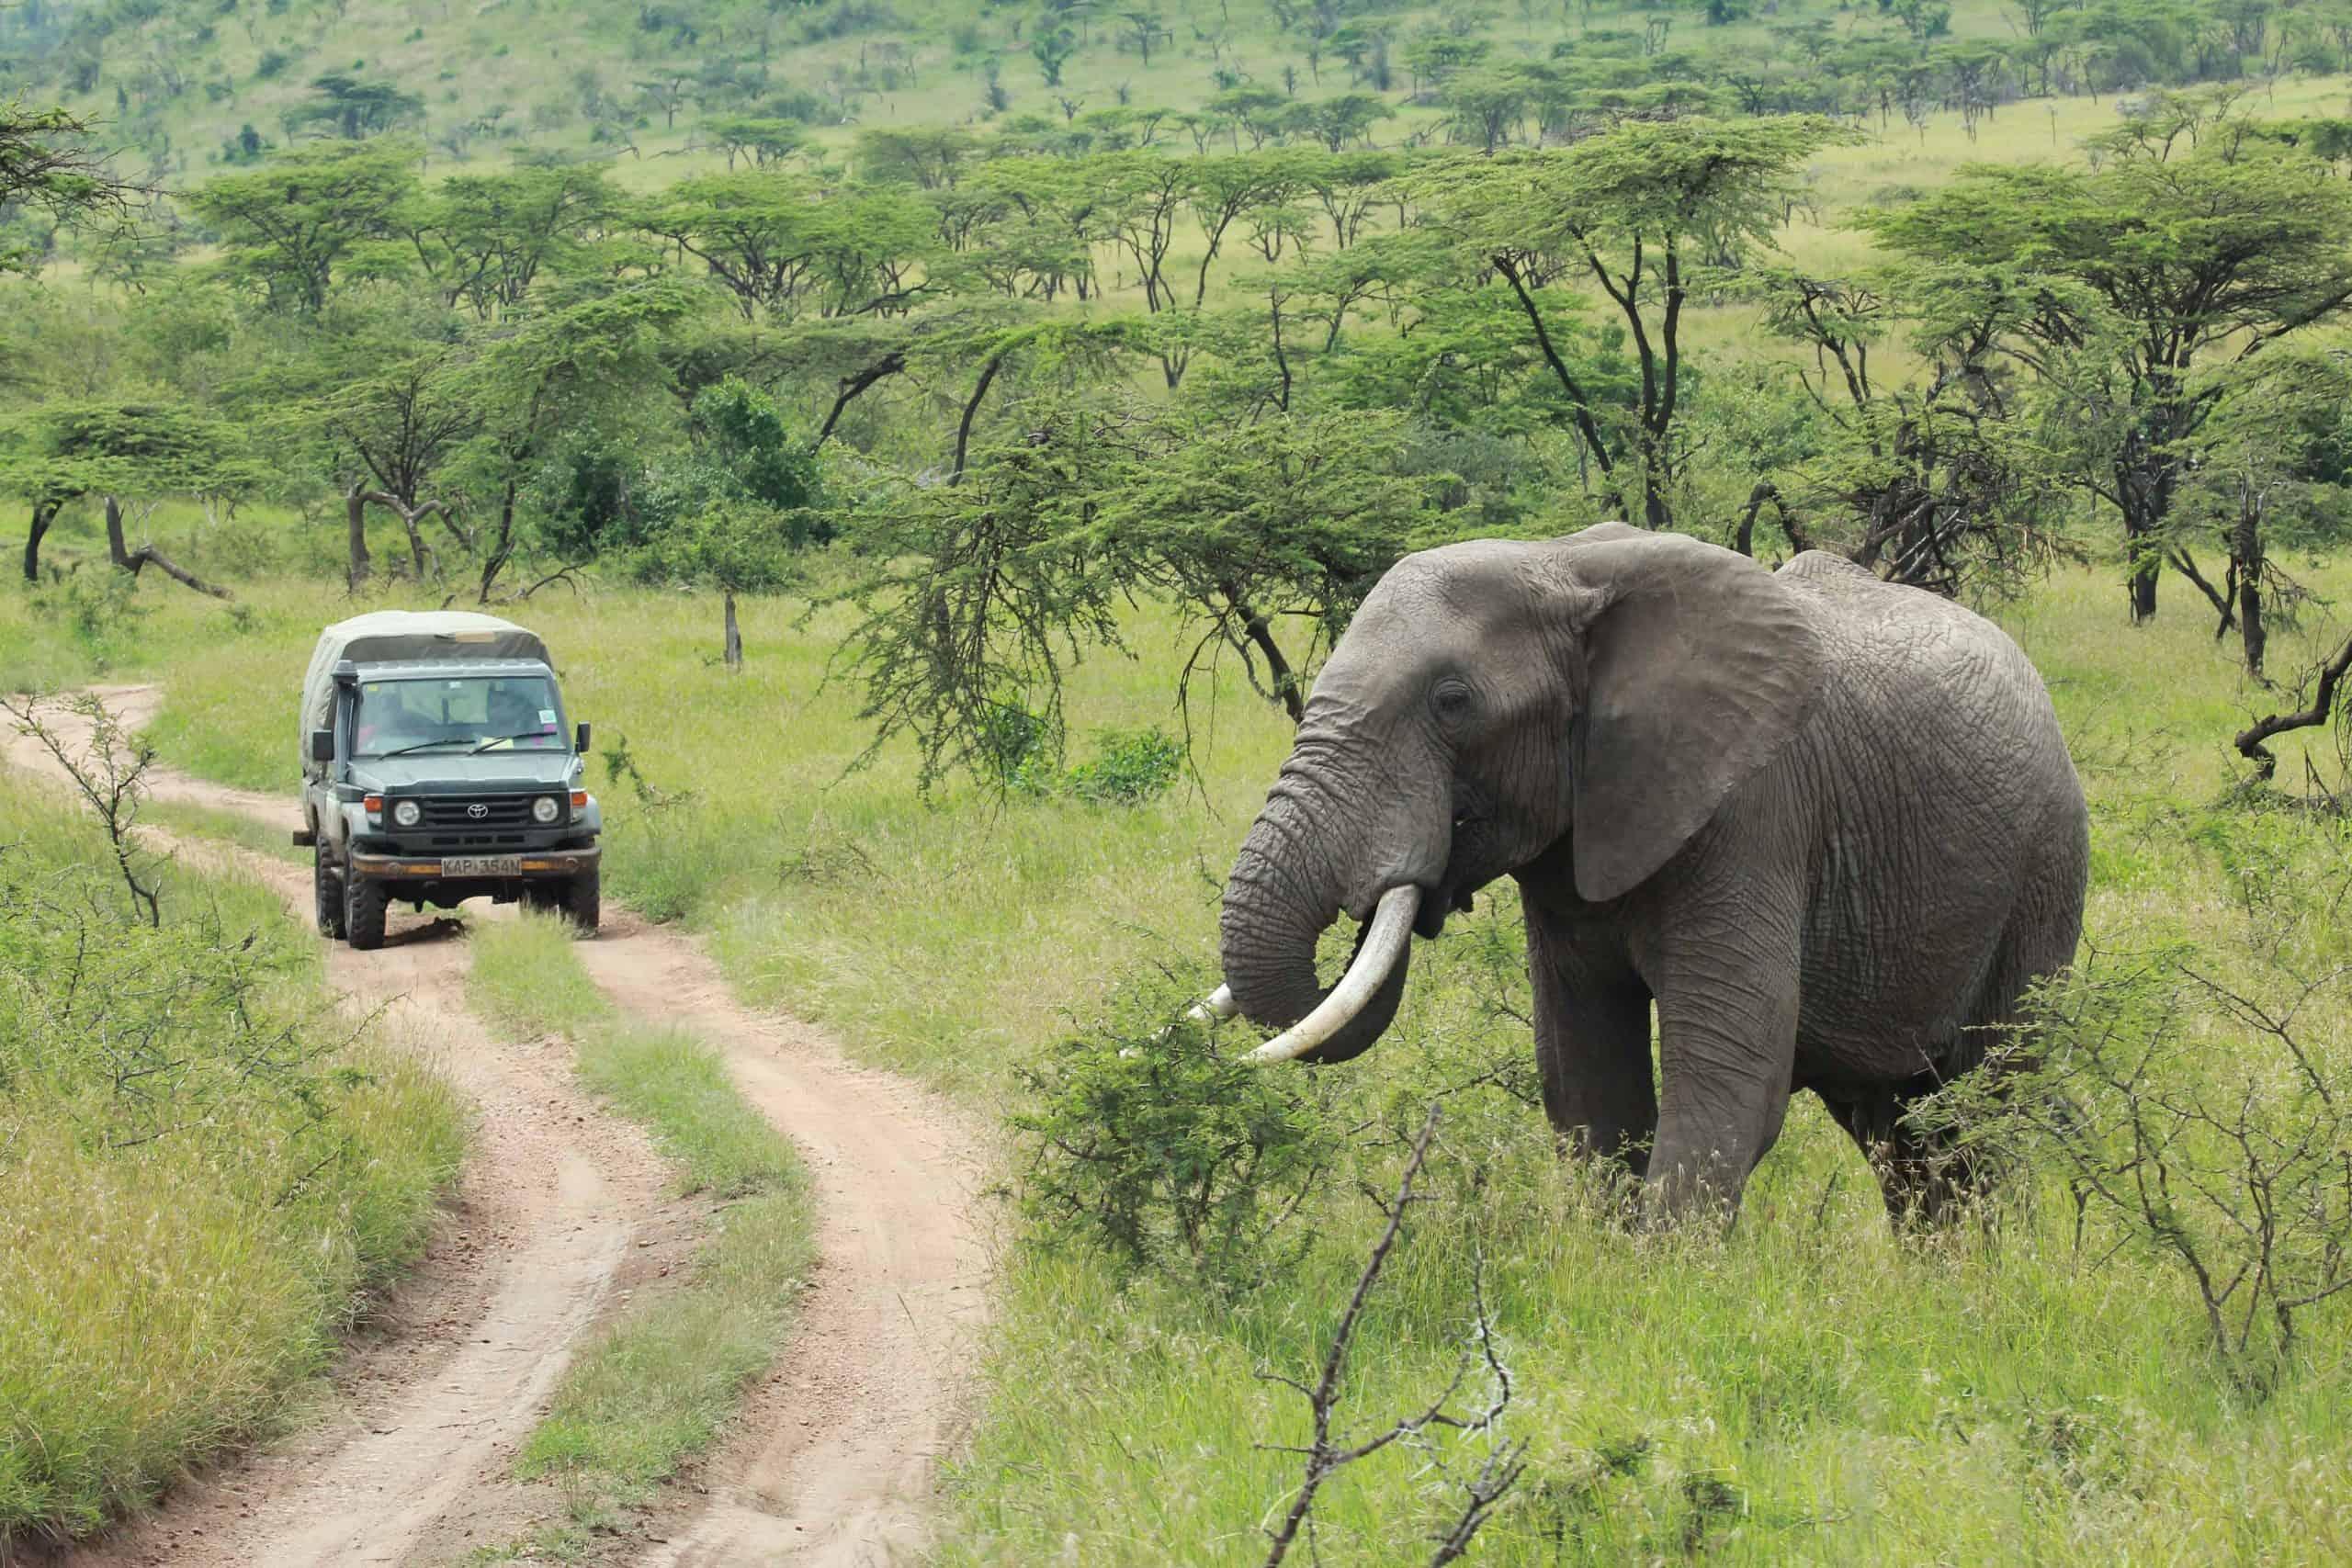 Burigi Chato Safaris Co. Ltd Serengeti Norongoro Safari Best Tour Agency Company Operator In Moshi Arusha Tanzania Africa) (6)